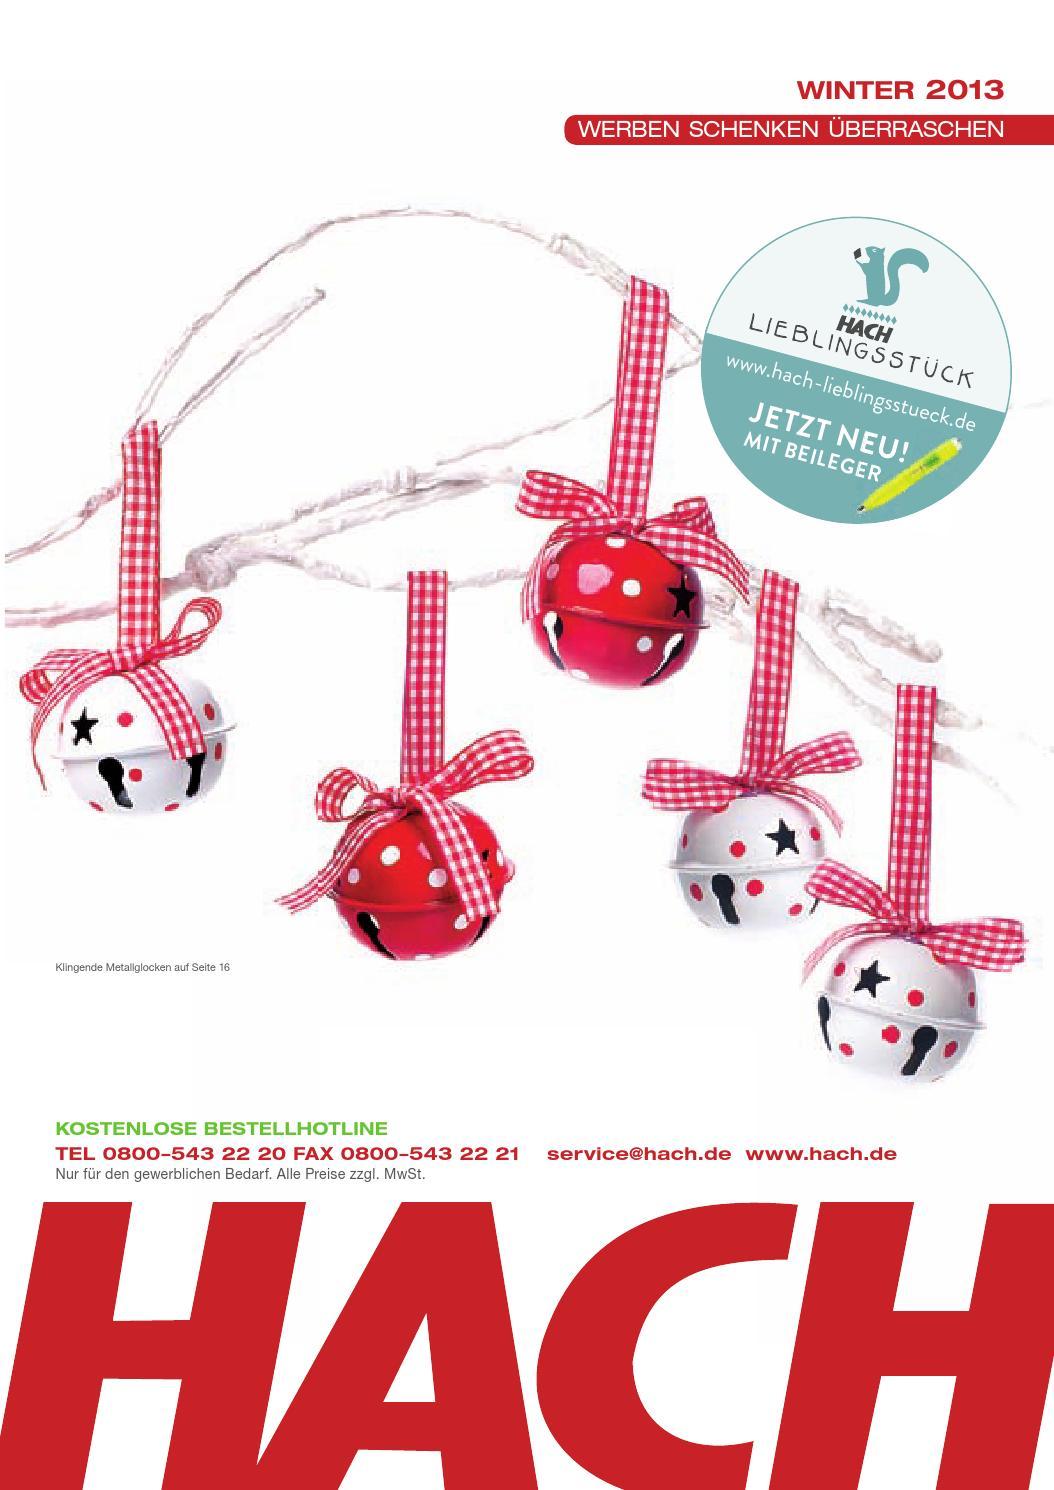 HACH Winter 9 by HACH GmbH & Co KG - issuu